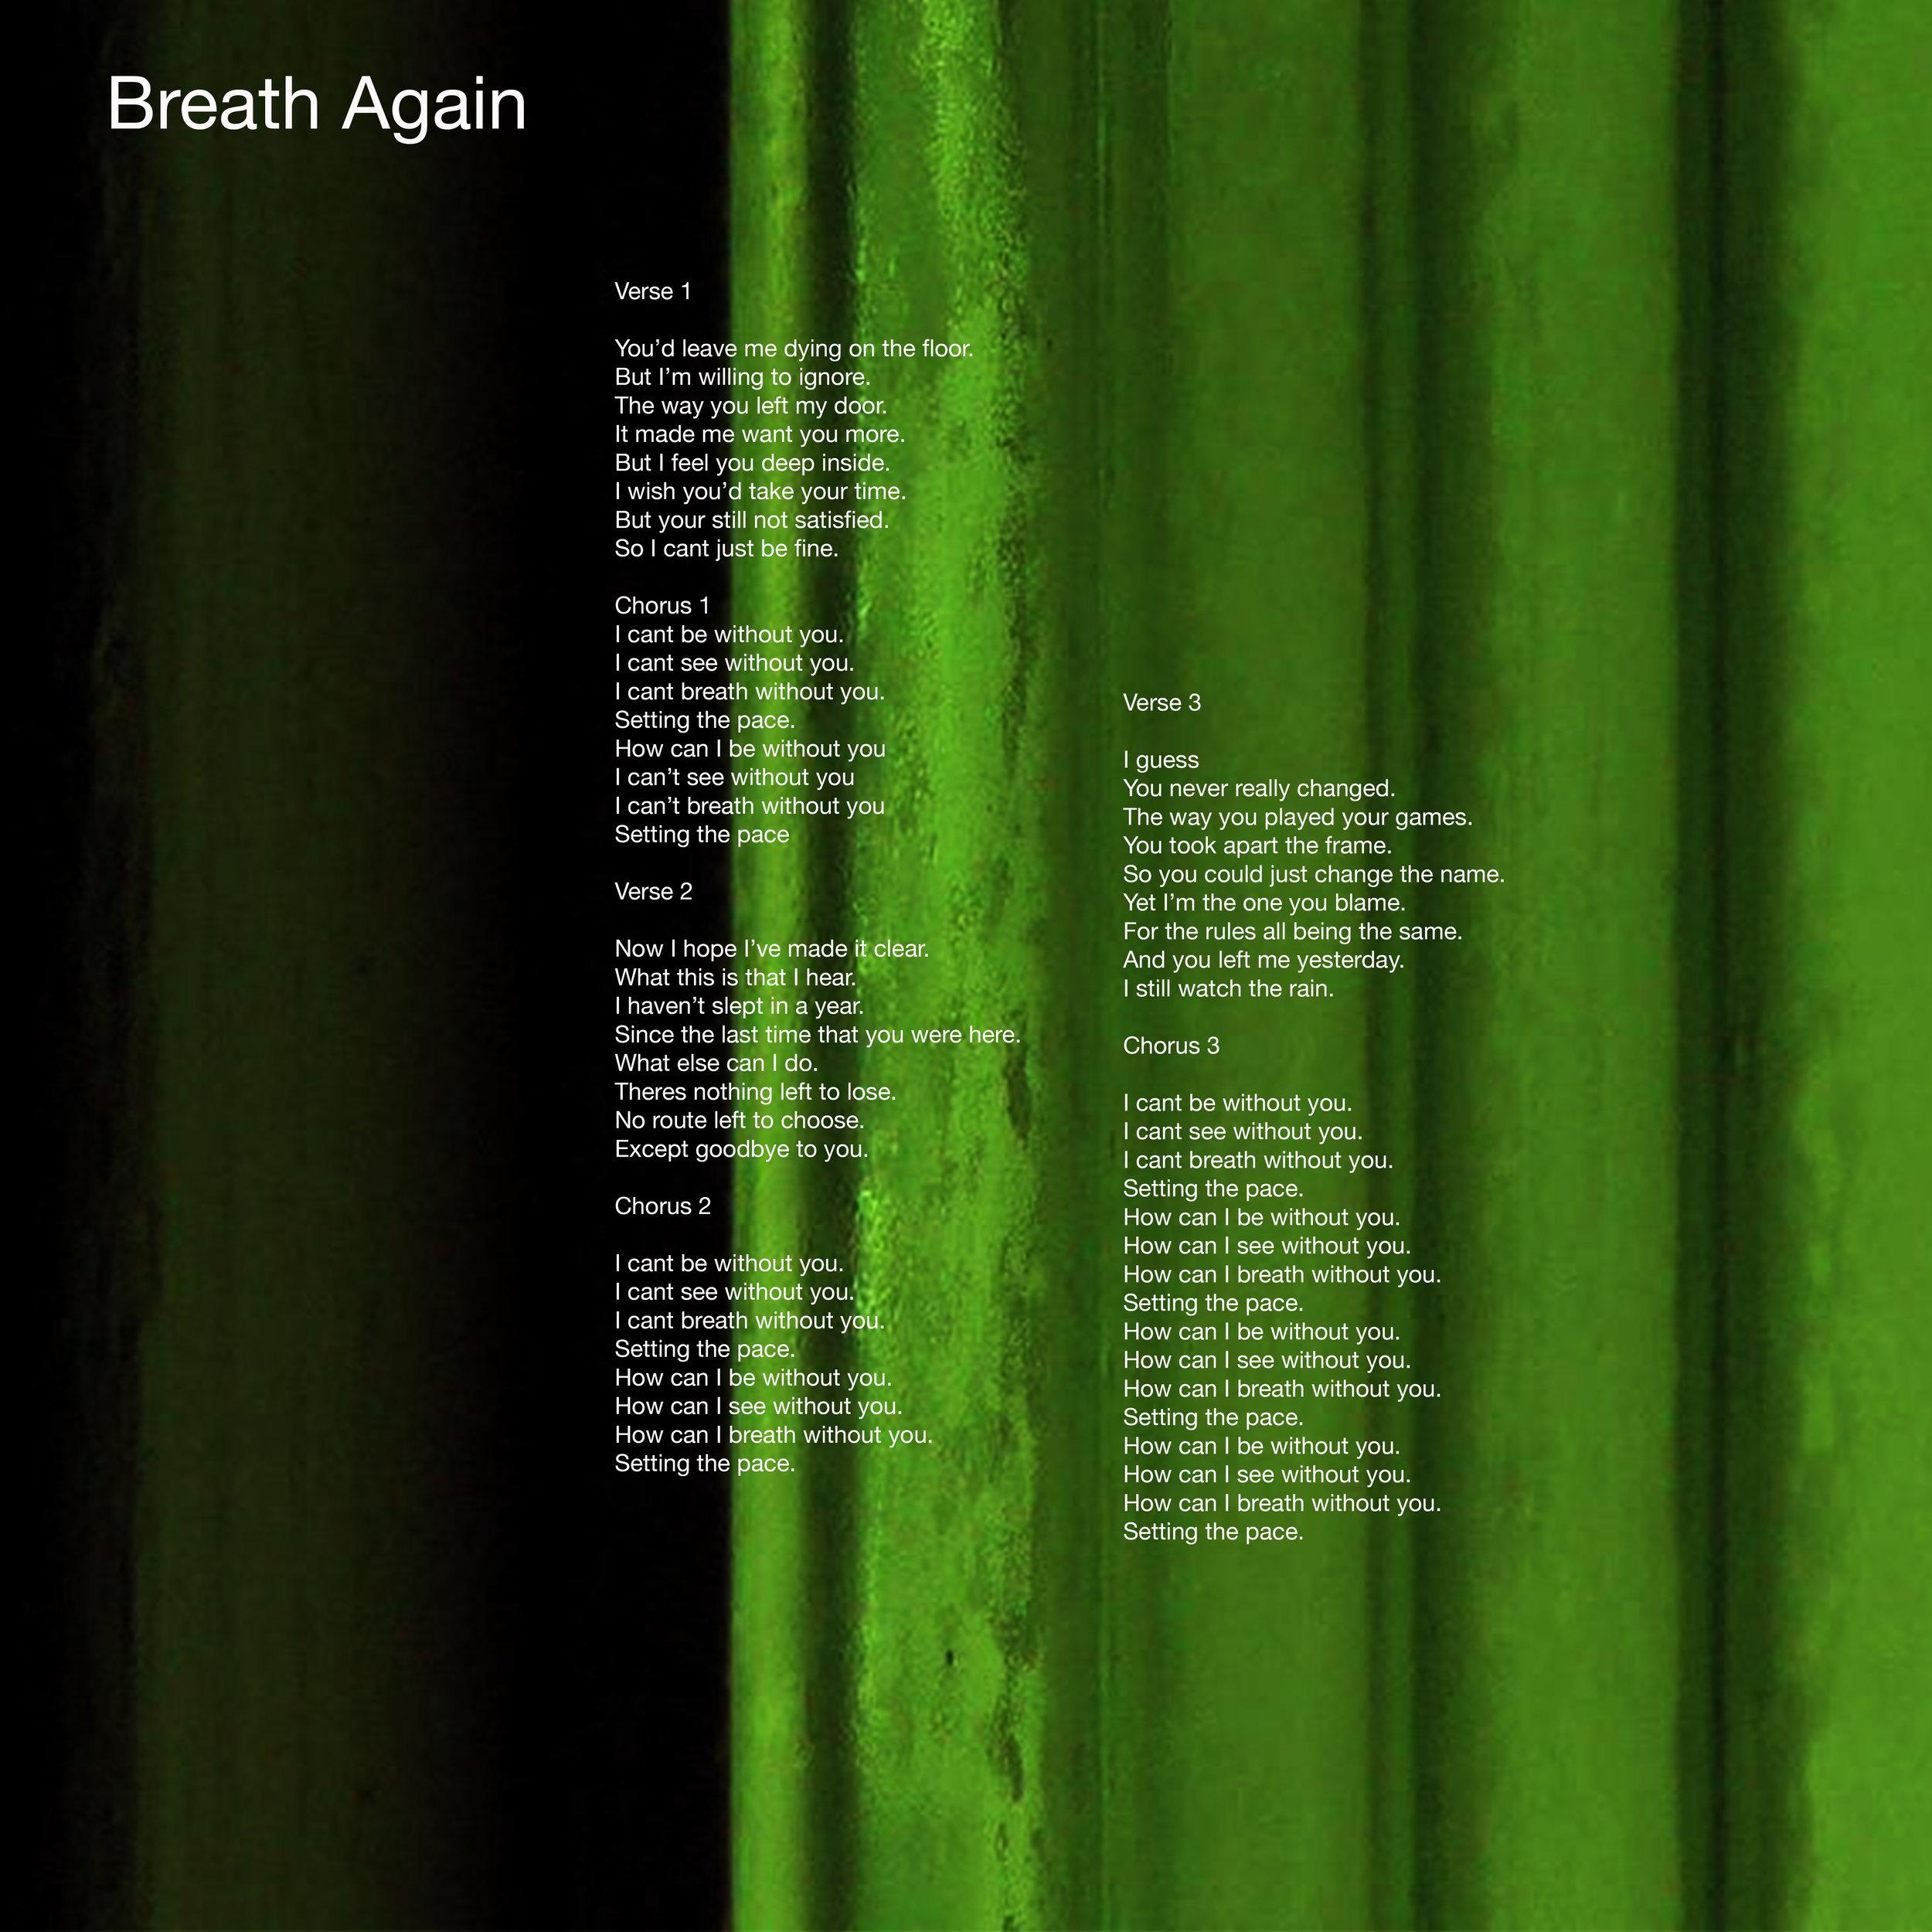 BreathAgainMTheoryLyricArtDLX.jpg